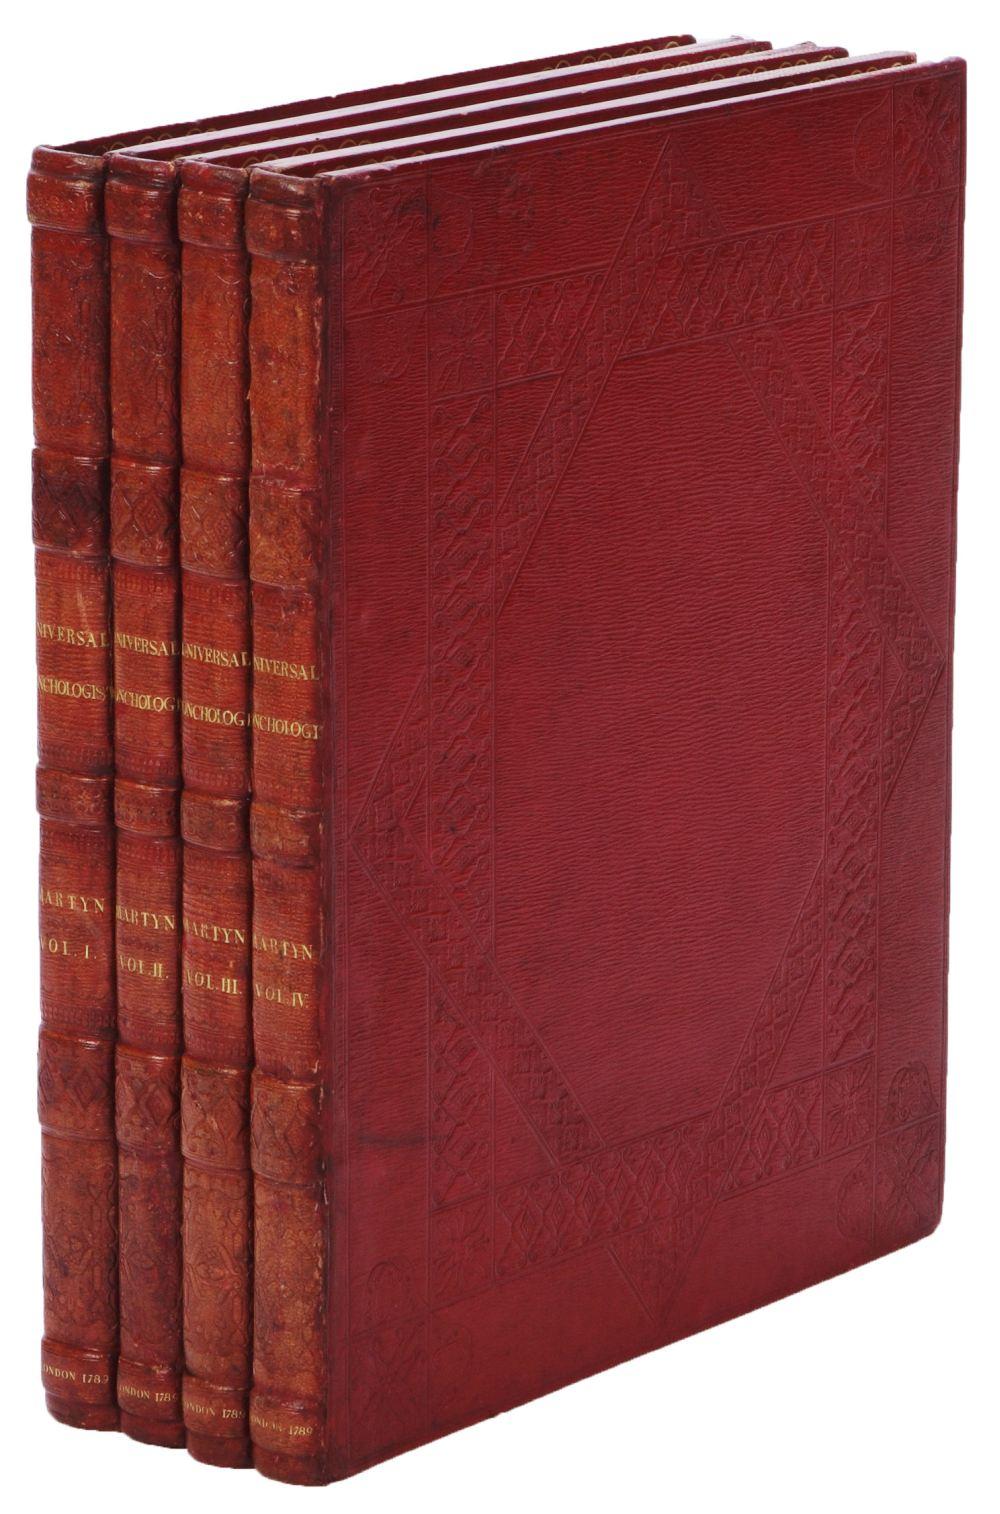 Natur Zvab Natural 100 Top Imperial Topaz 1427 Vols I And Ii Figures Of Non Descript Martyn T